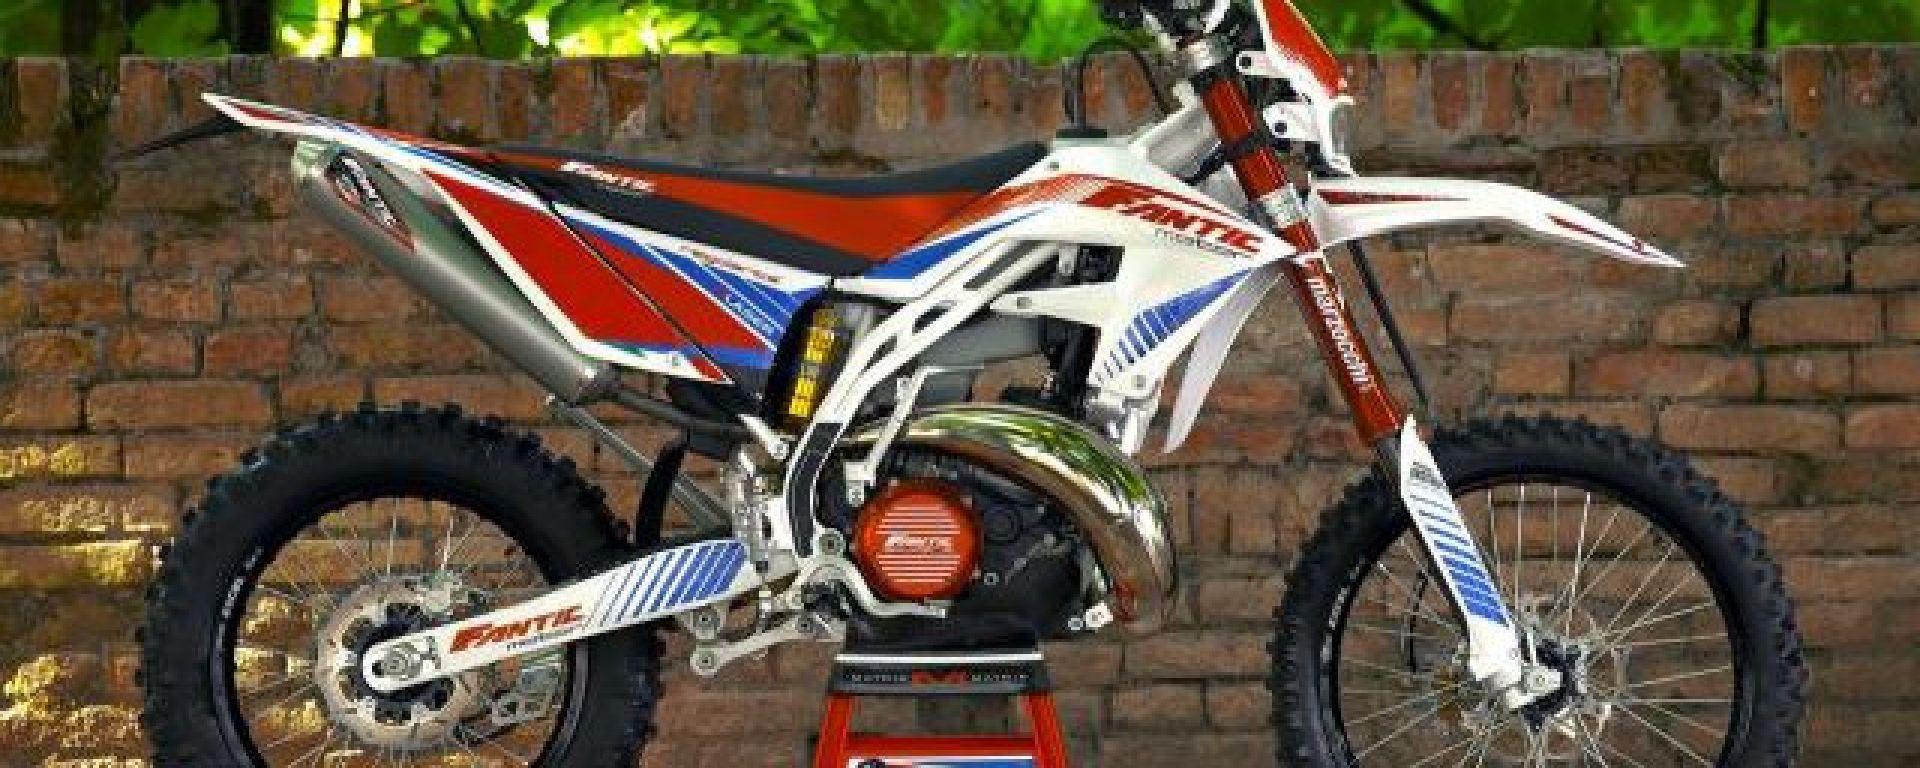 Fantic Motor 2013